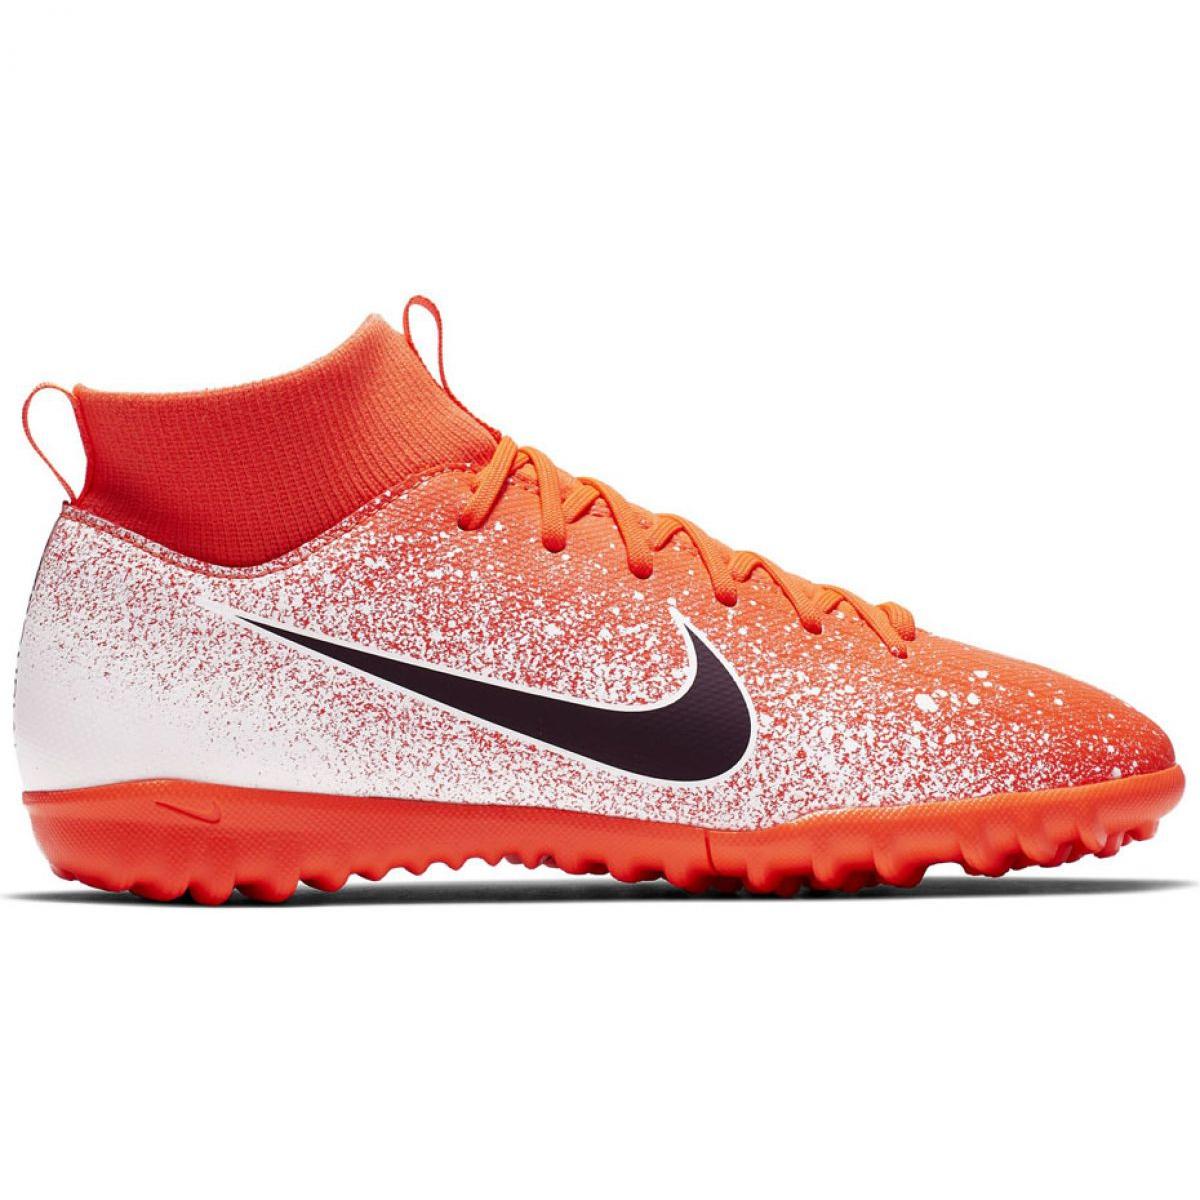 Botas de fútbol Nike Mercurial Superfly X 6 Academy Tf Jr AH7344 801 blanco naranja naranja